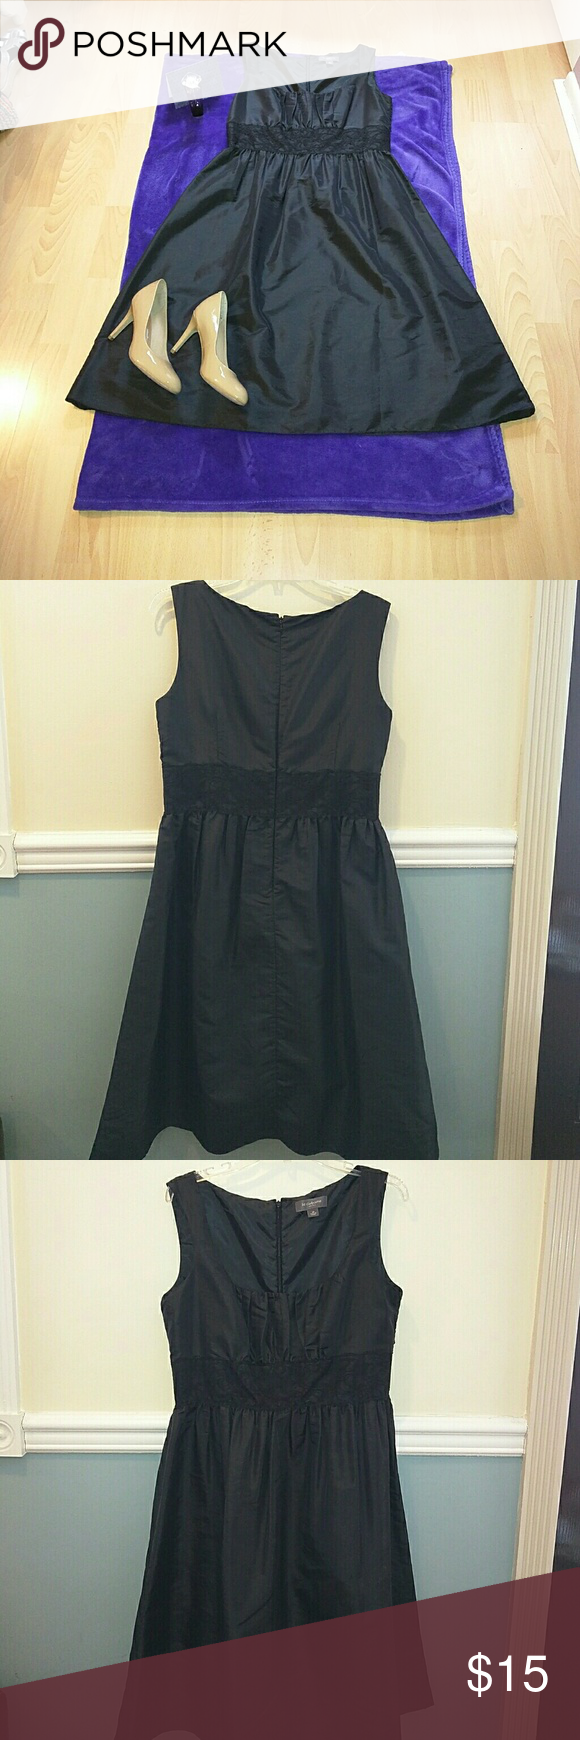 Liz Claiborne elegant black dress Black sleeveless Liz Claiborne dress. In good condition. Cute lacing . Liz Claiborne Dresses